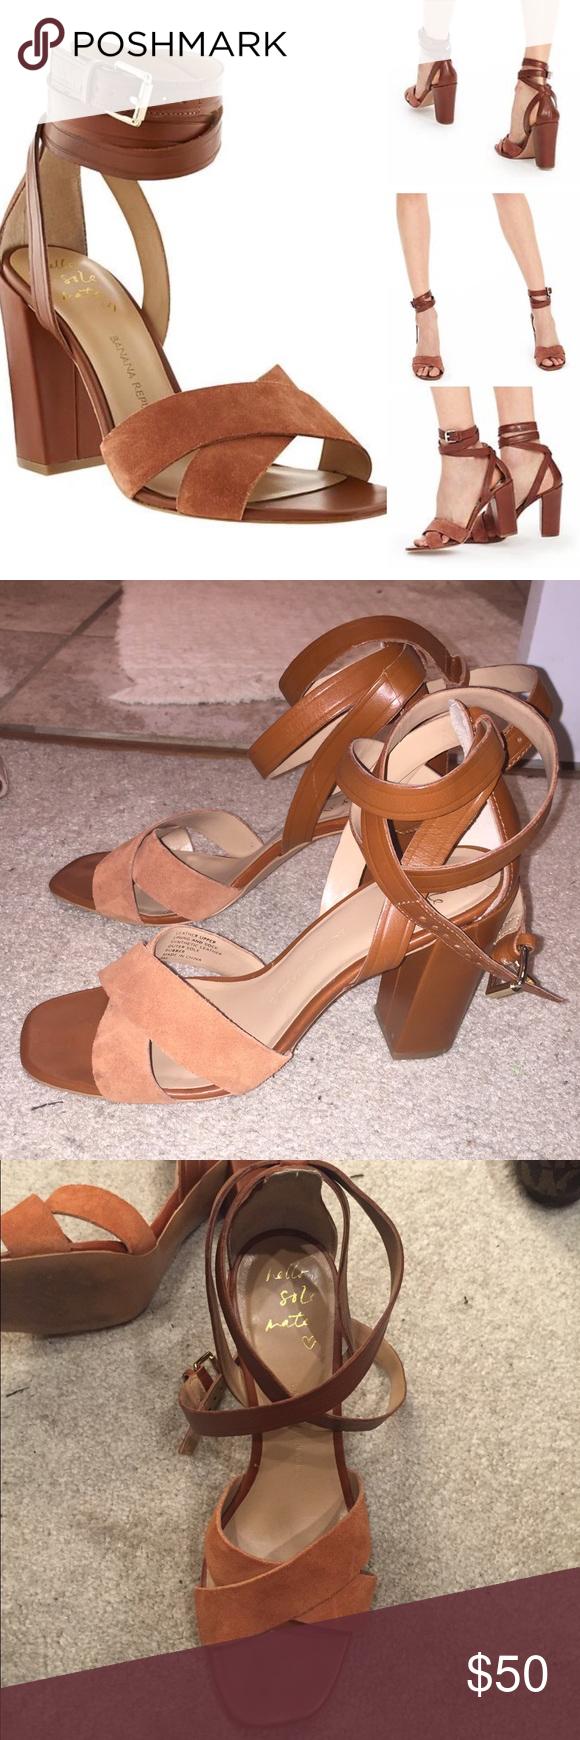 d0f77ec27f4 Banana Republic camel ankle wrap Pella heels. Chicago StoreHeeled  SandalsShoes ...